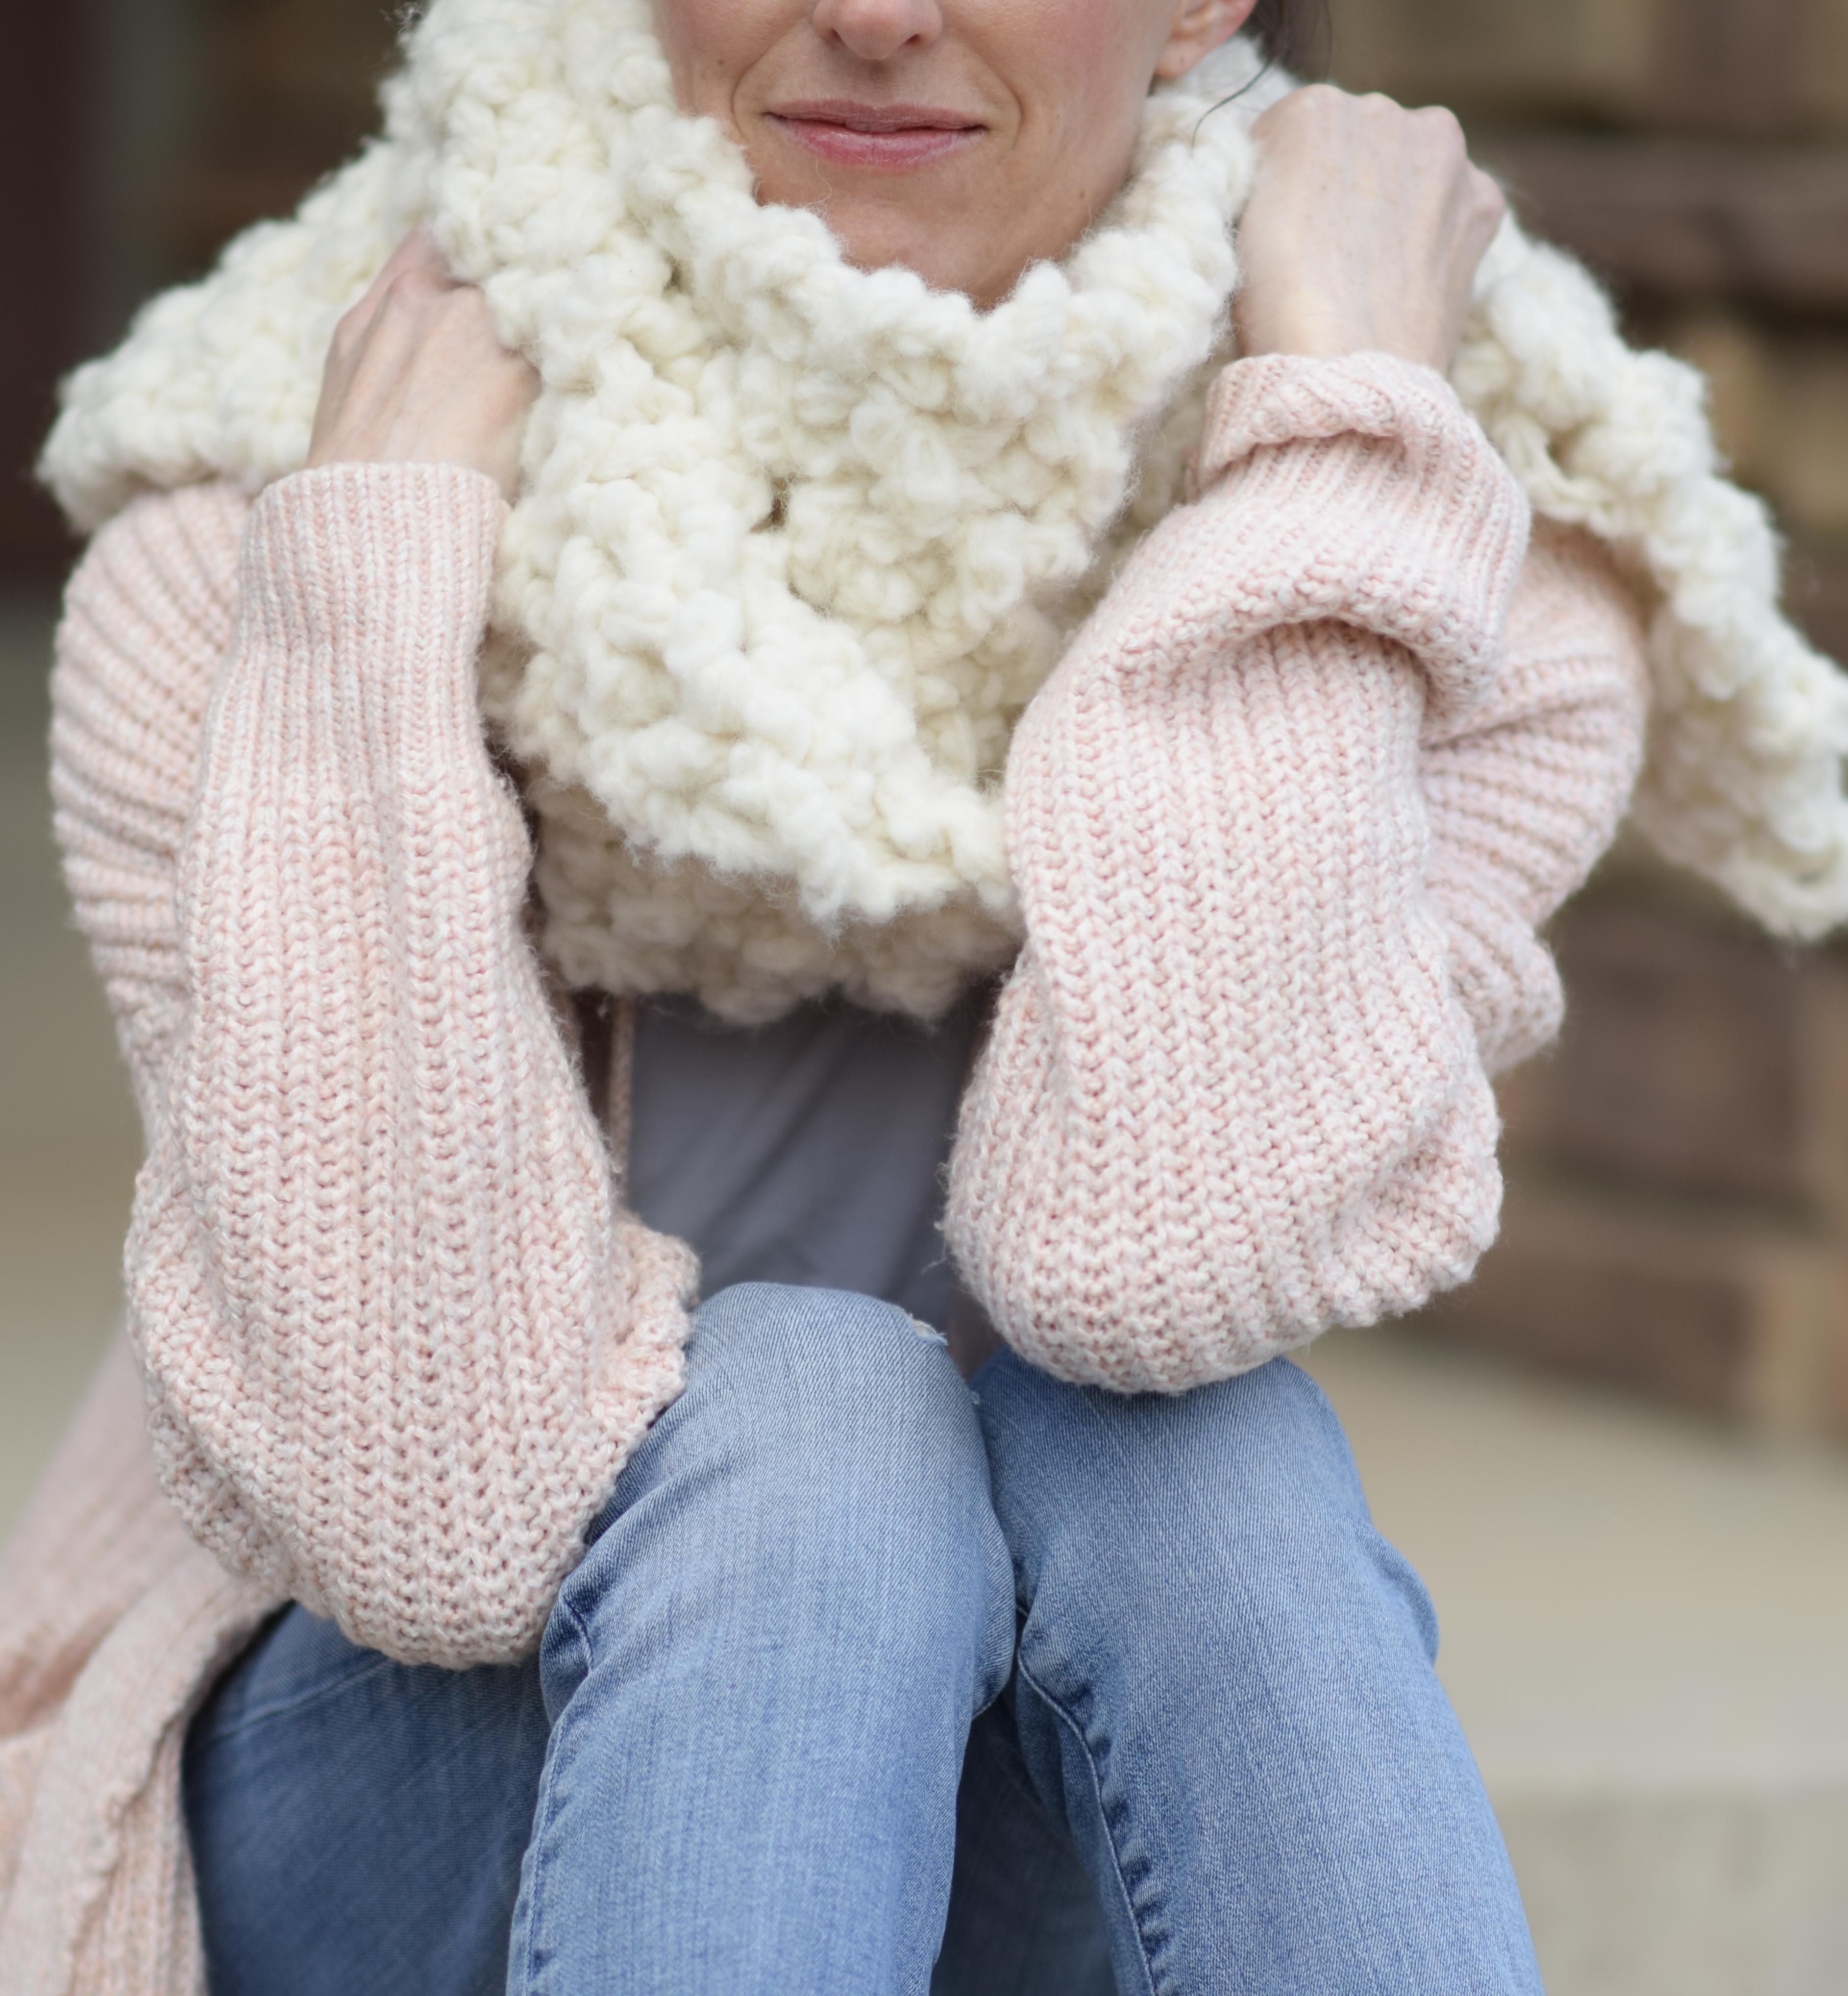 Big Luxurious Alpaca Knit Scarf Pattern – Mama In A Stitch